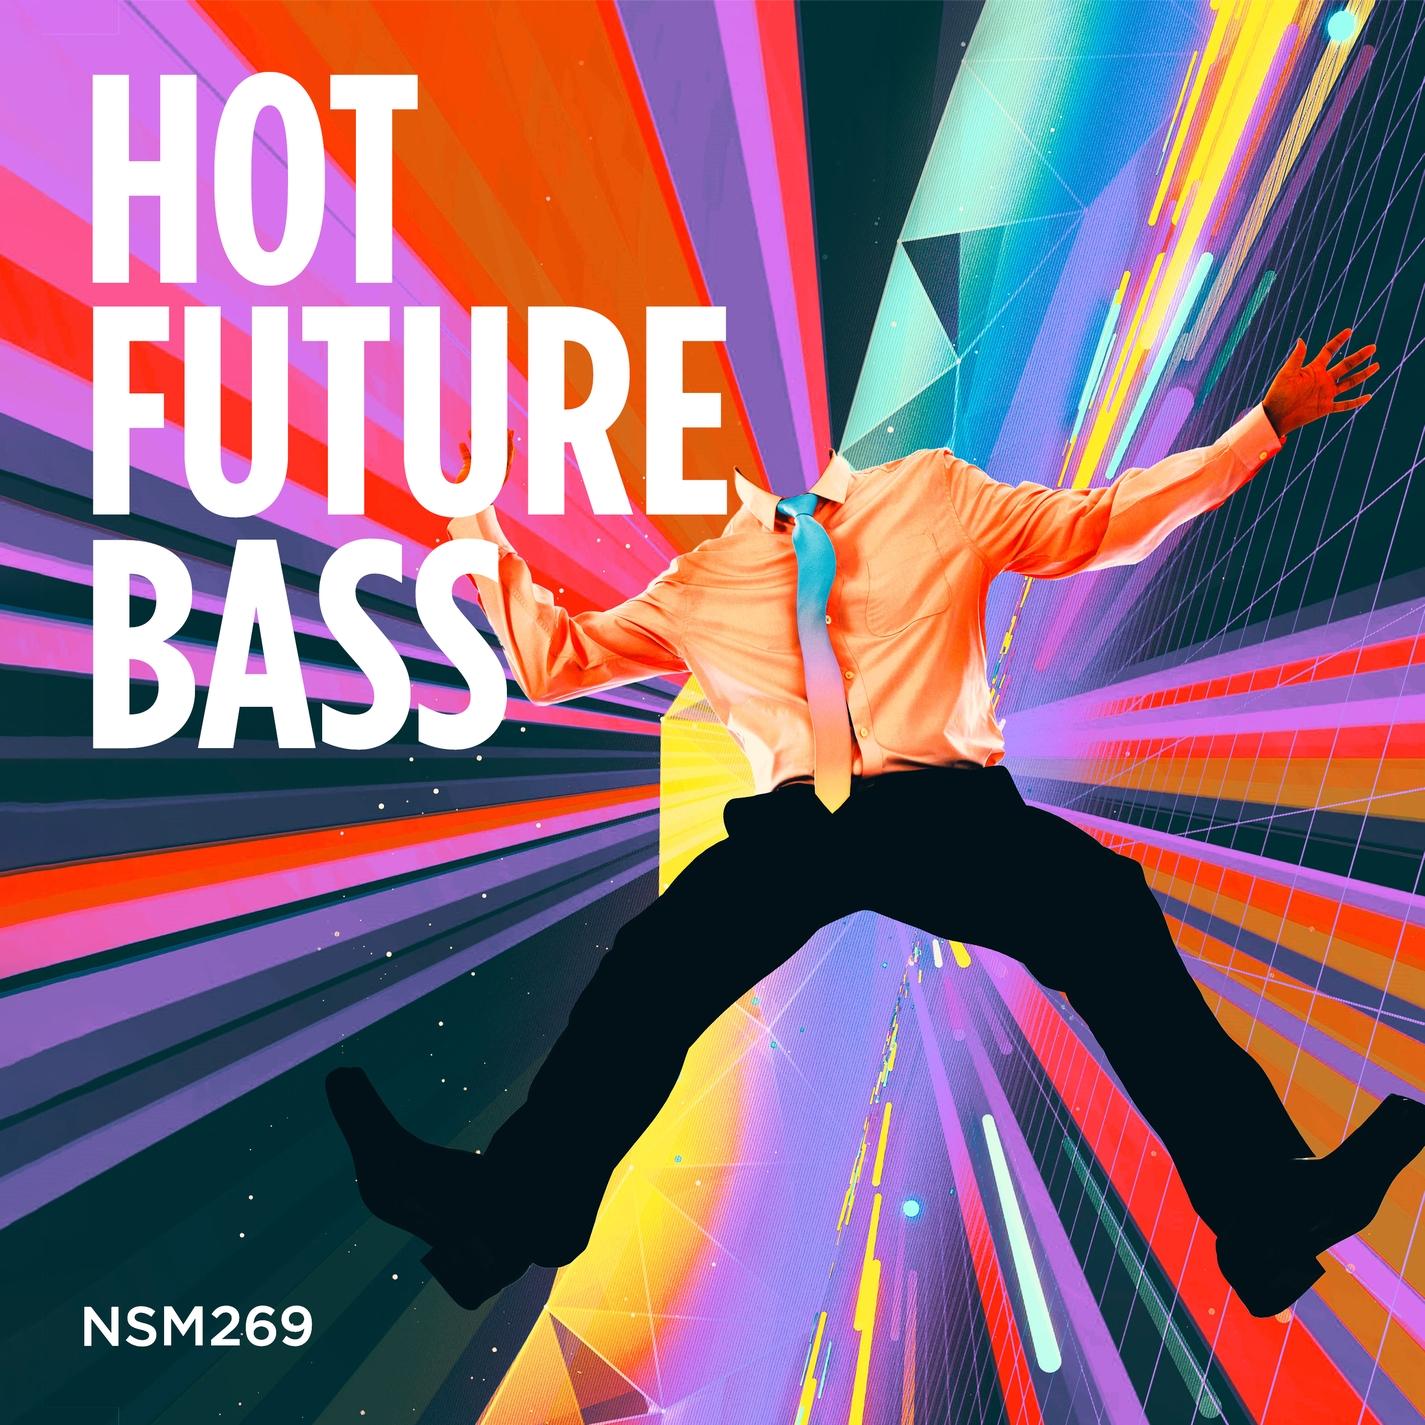 Hot Future Bass